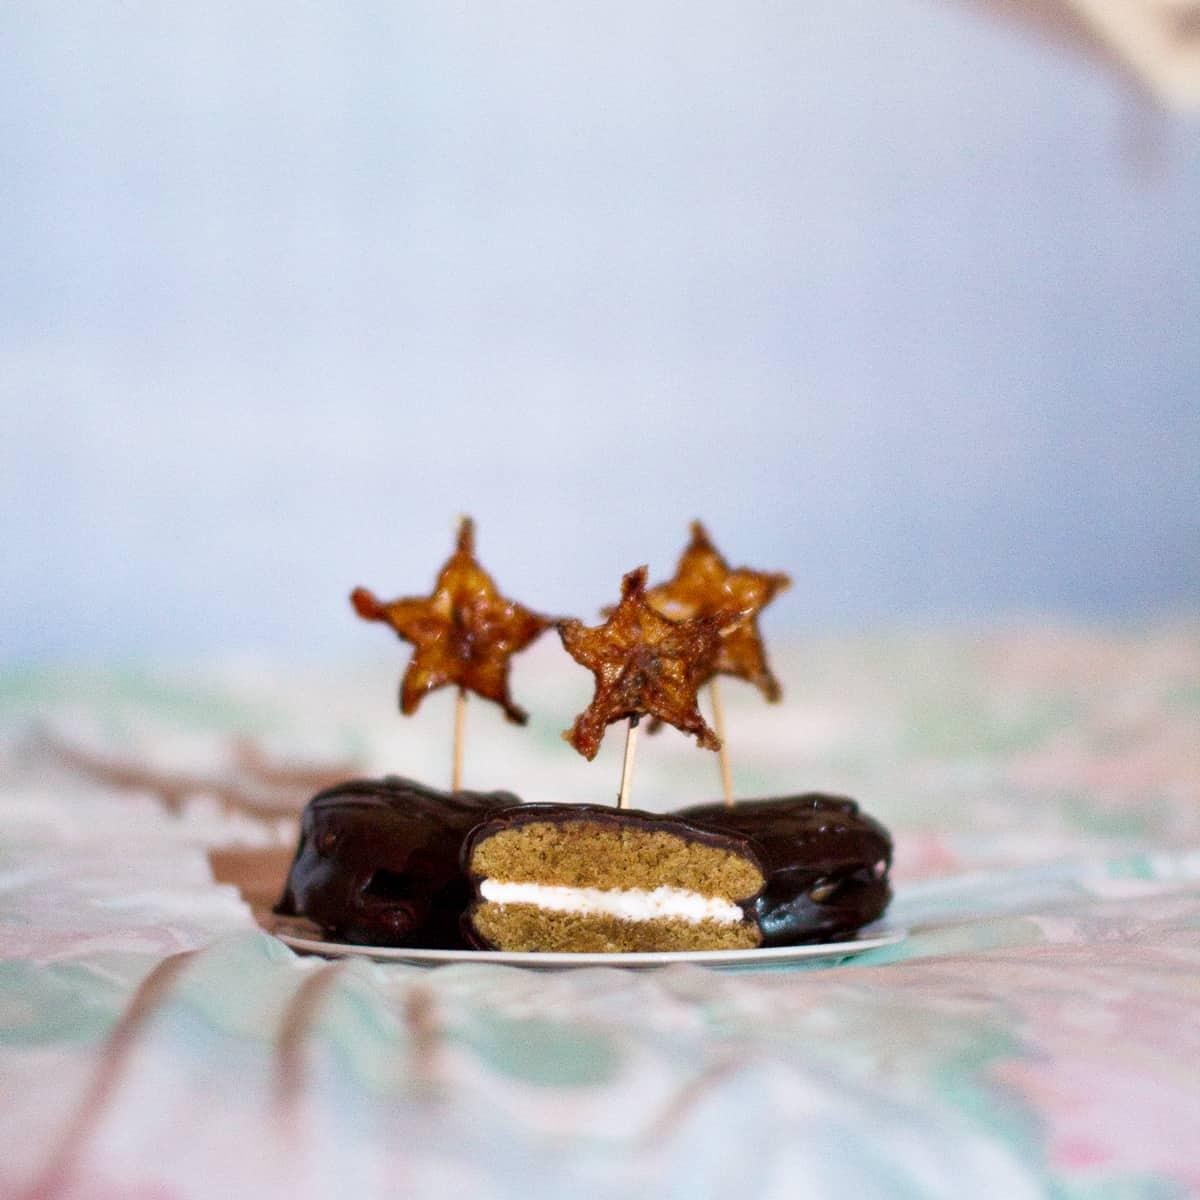 candied-starfruit